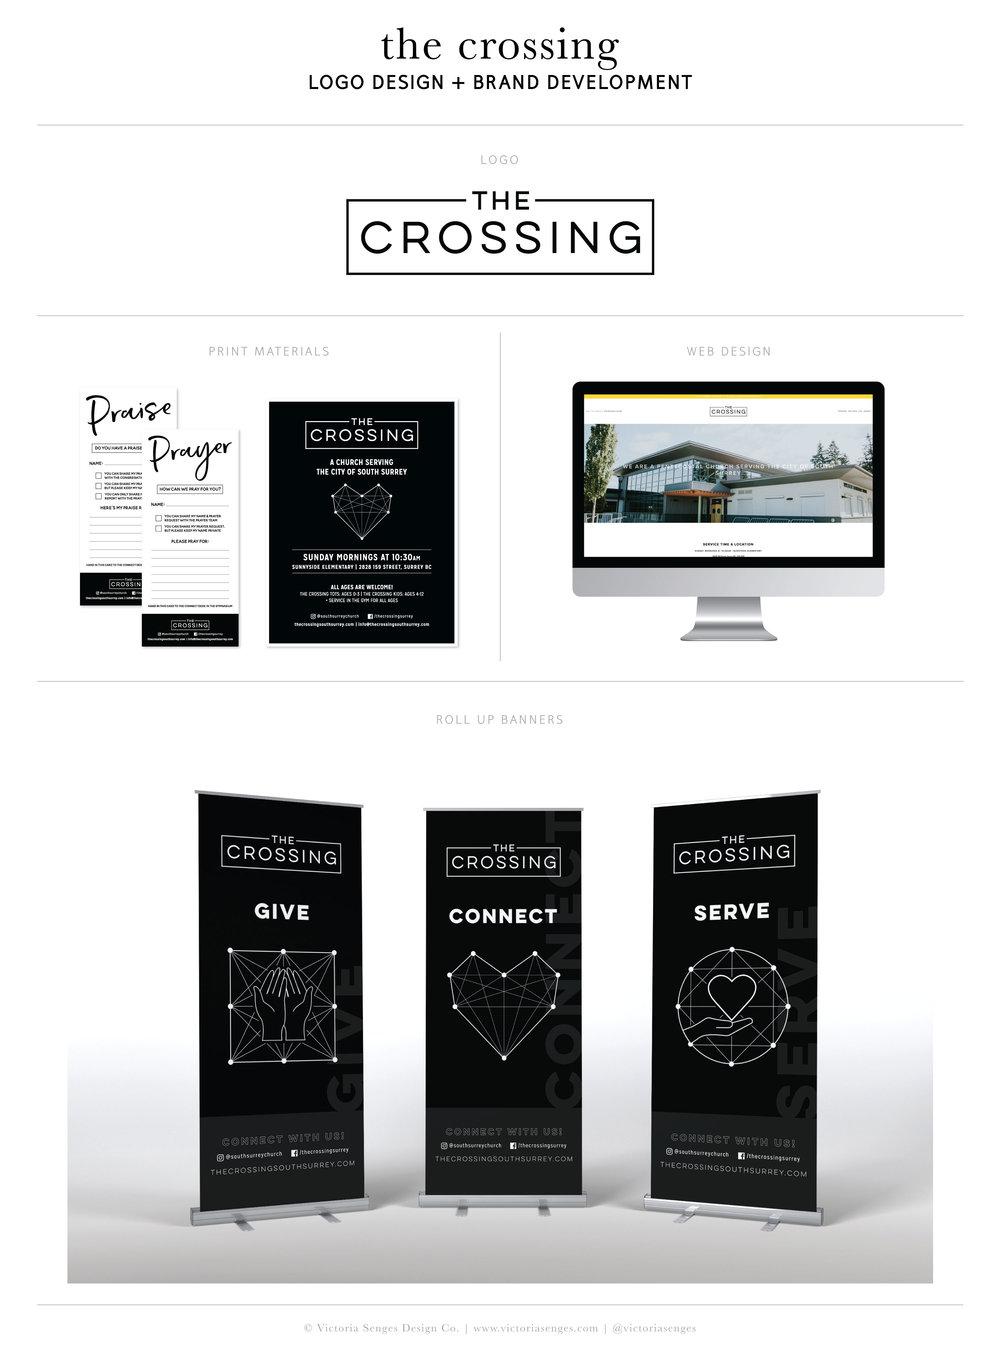 thecrossing-branding.jpg